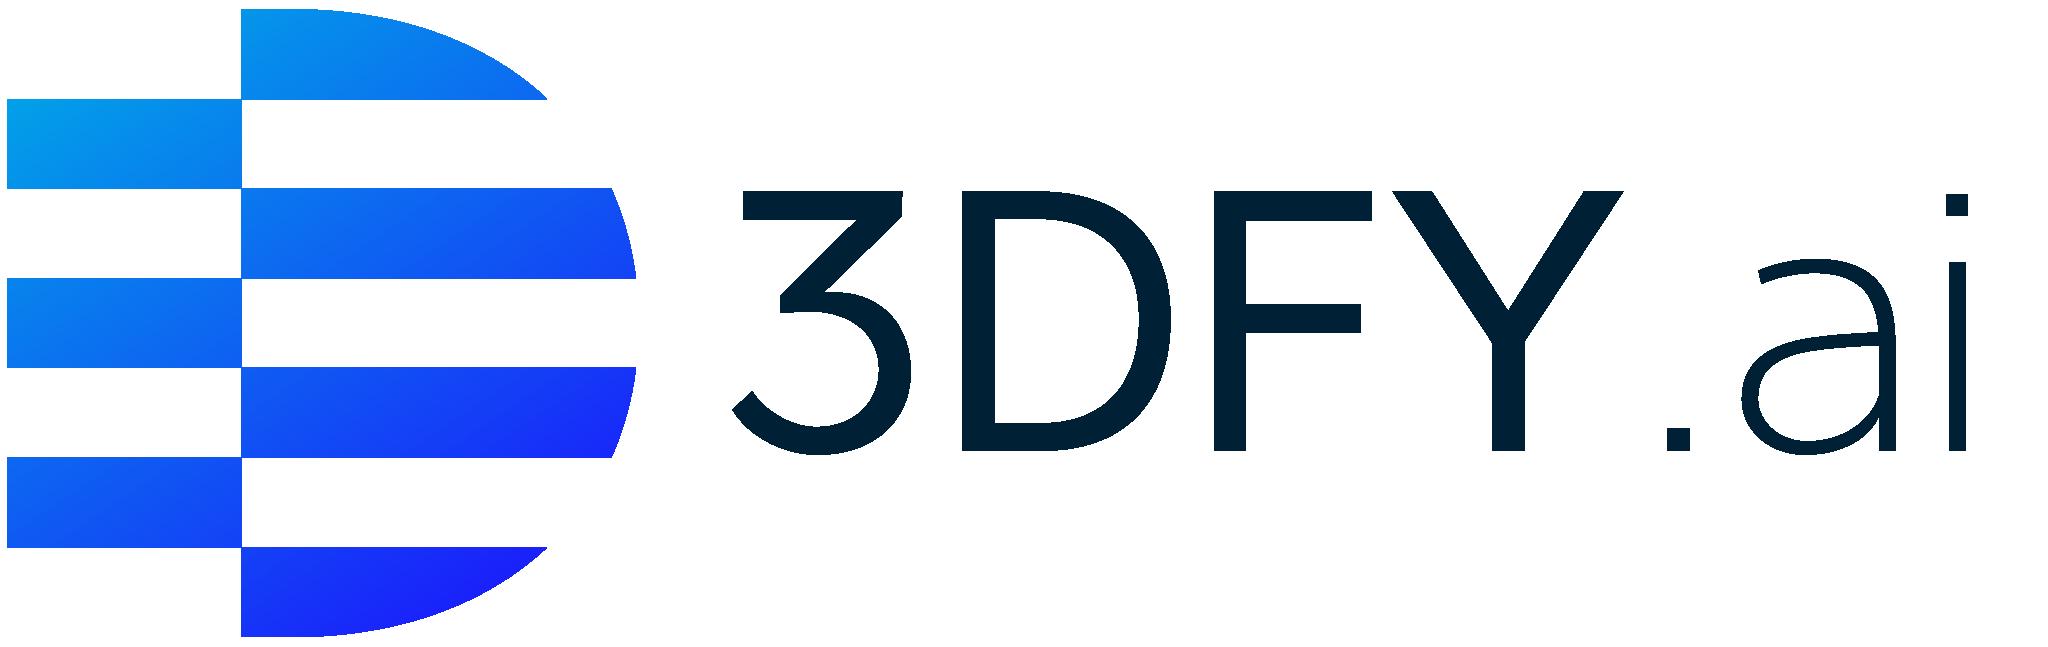 3dfy_nvmFont_white-2